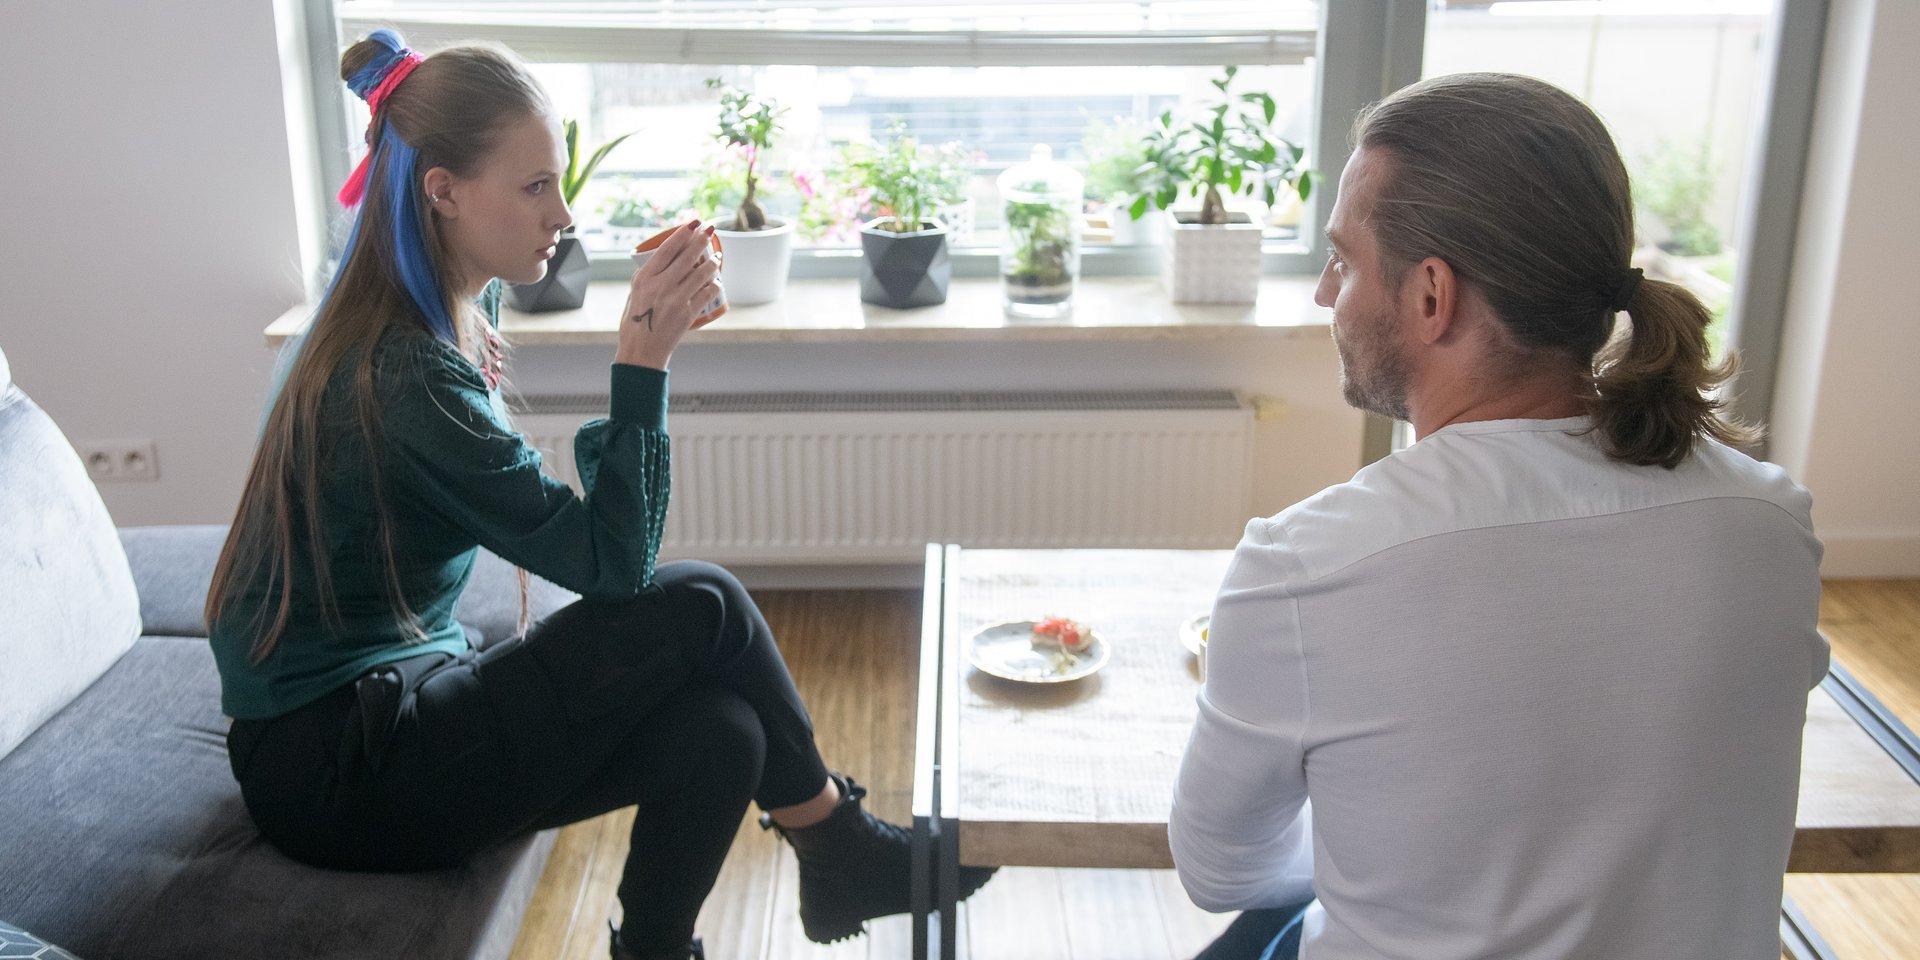 Na Wspólnej: Renata nie chce już Sławka, a Daria Adama?!